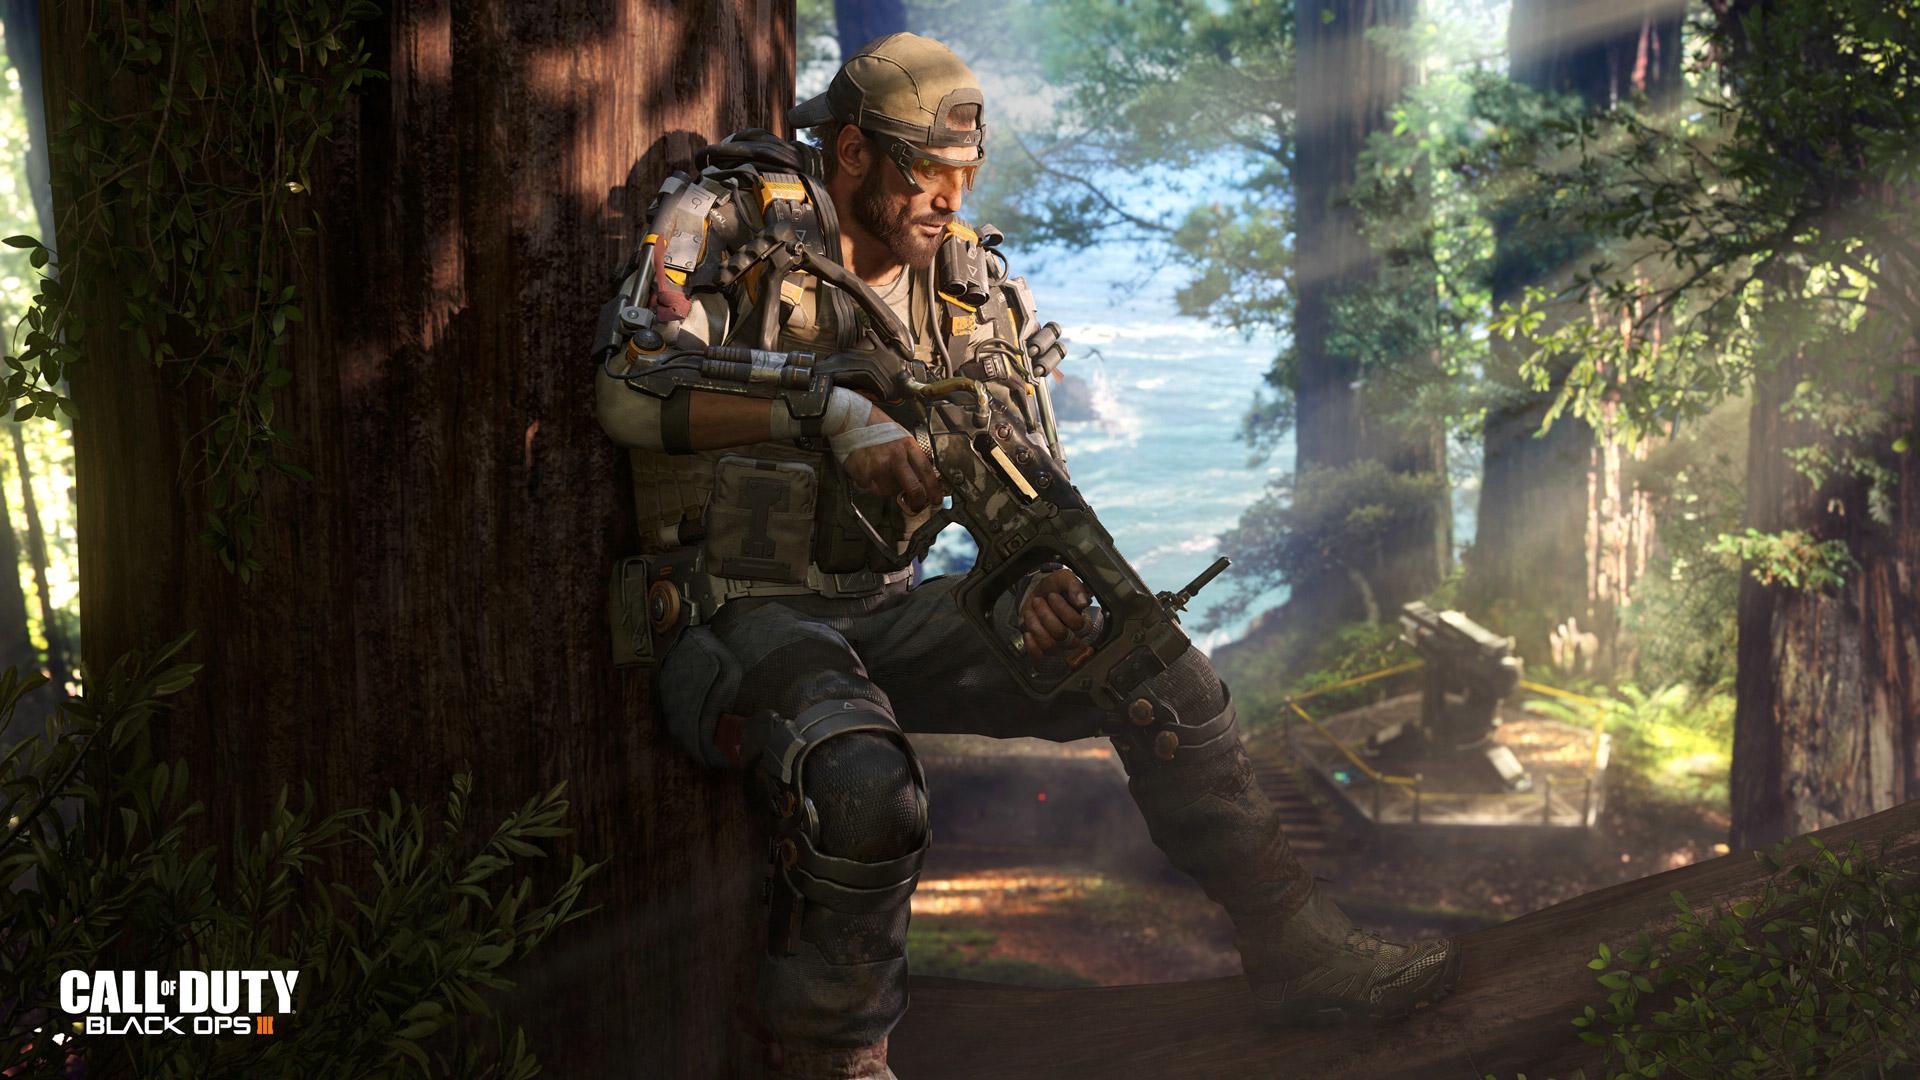 Free Call of Duty: Black Ops III Wallpaper in 1920x1080